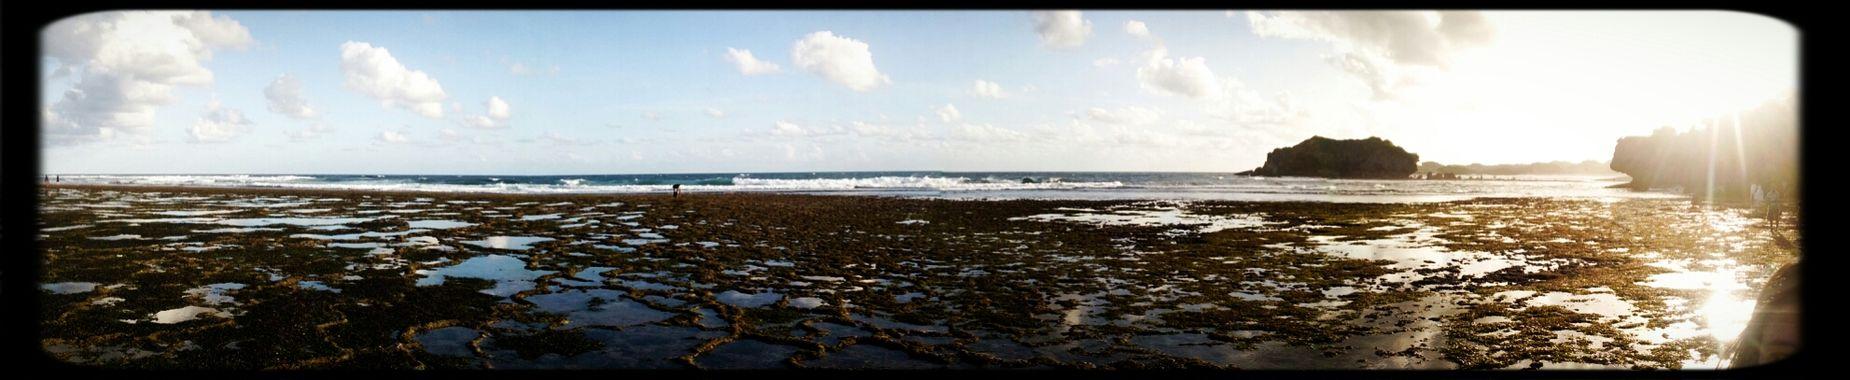 Beach Sea Panorama